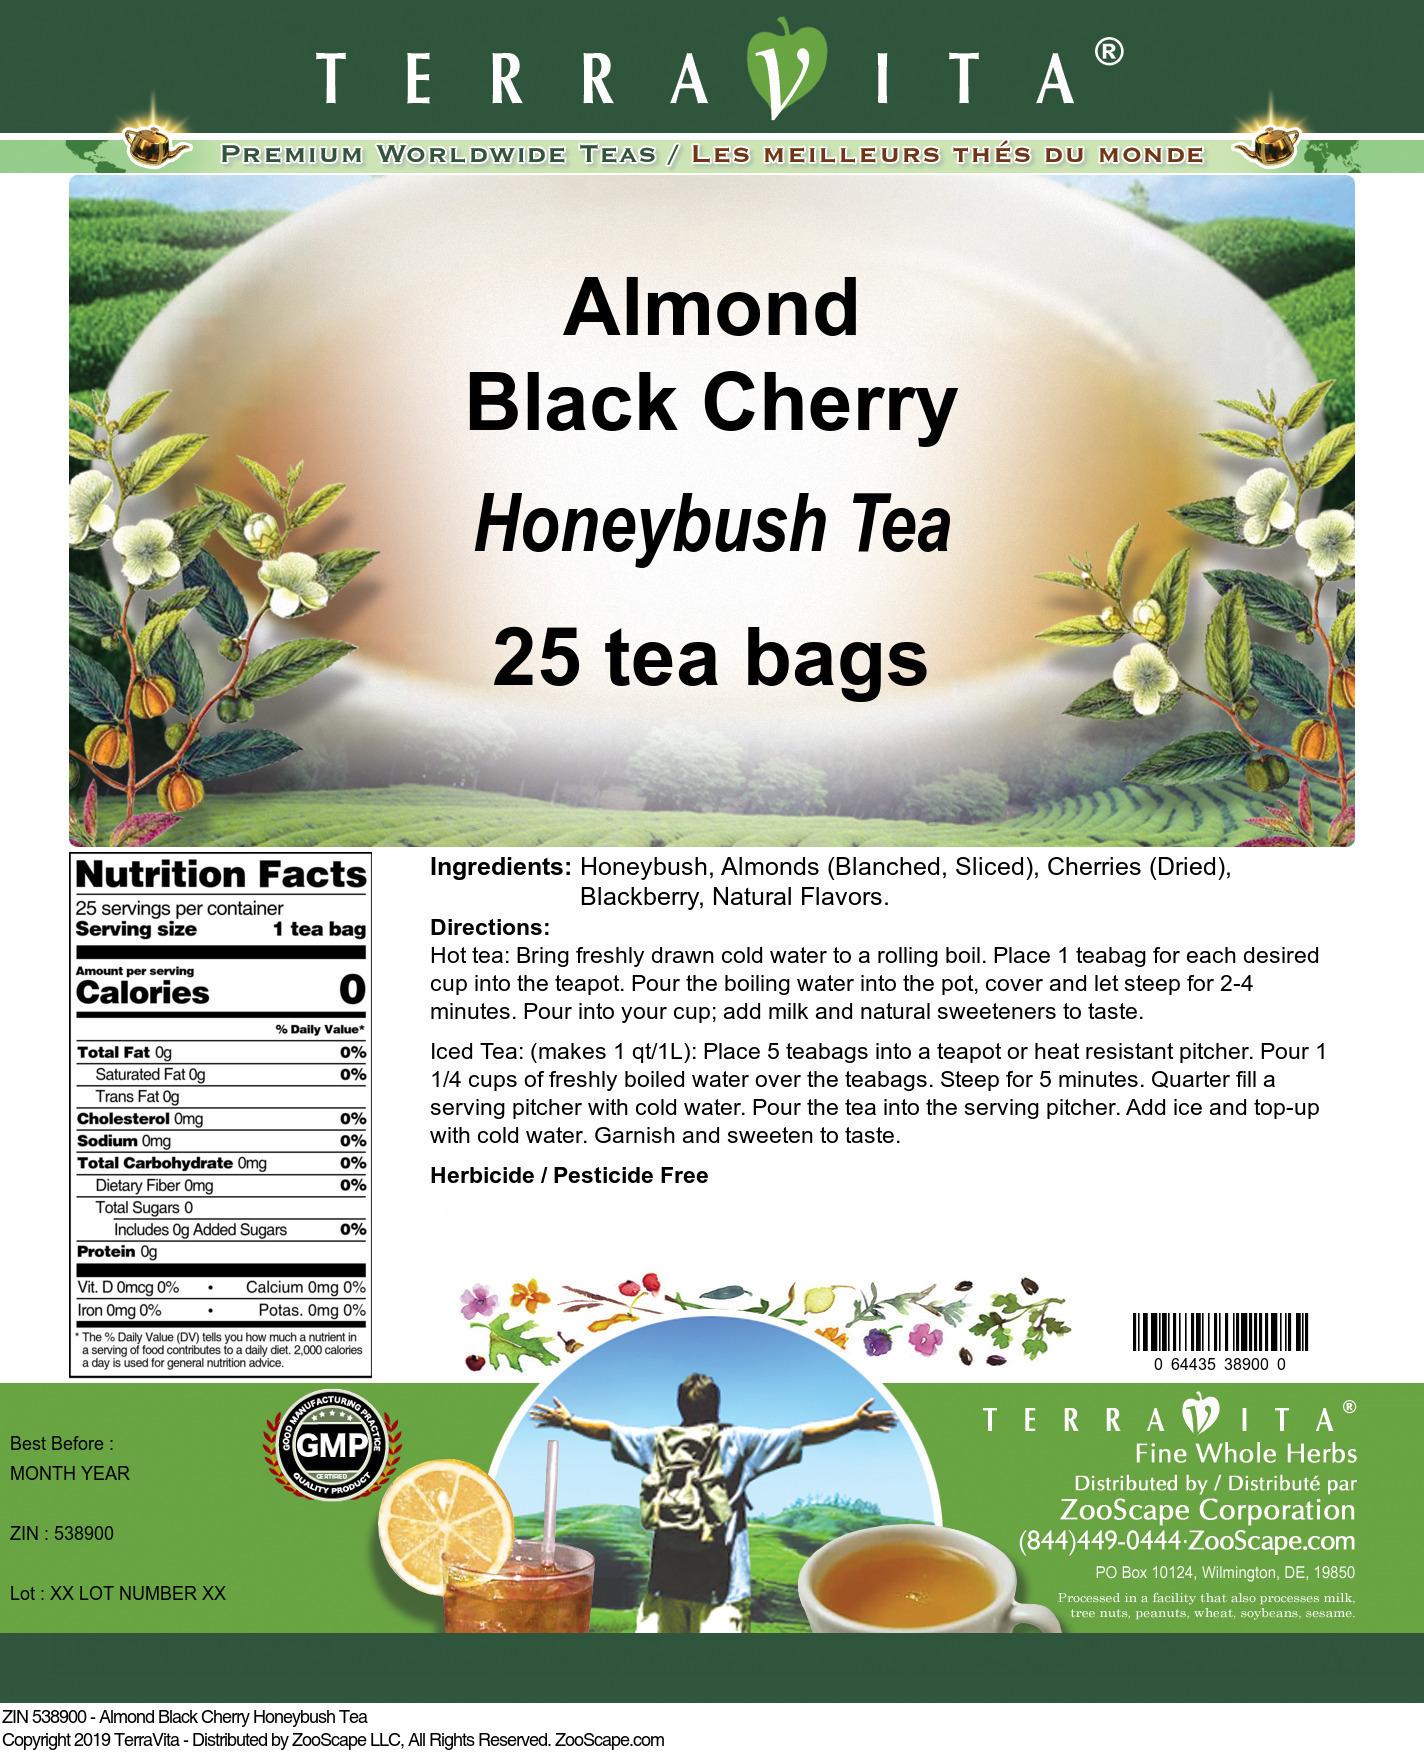 Almond Black Cherry Honeybush Tea